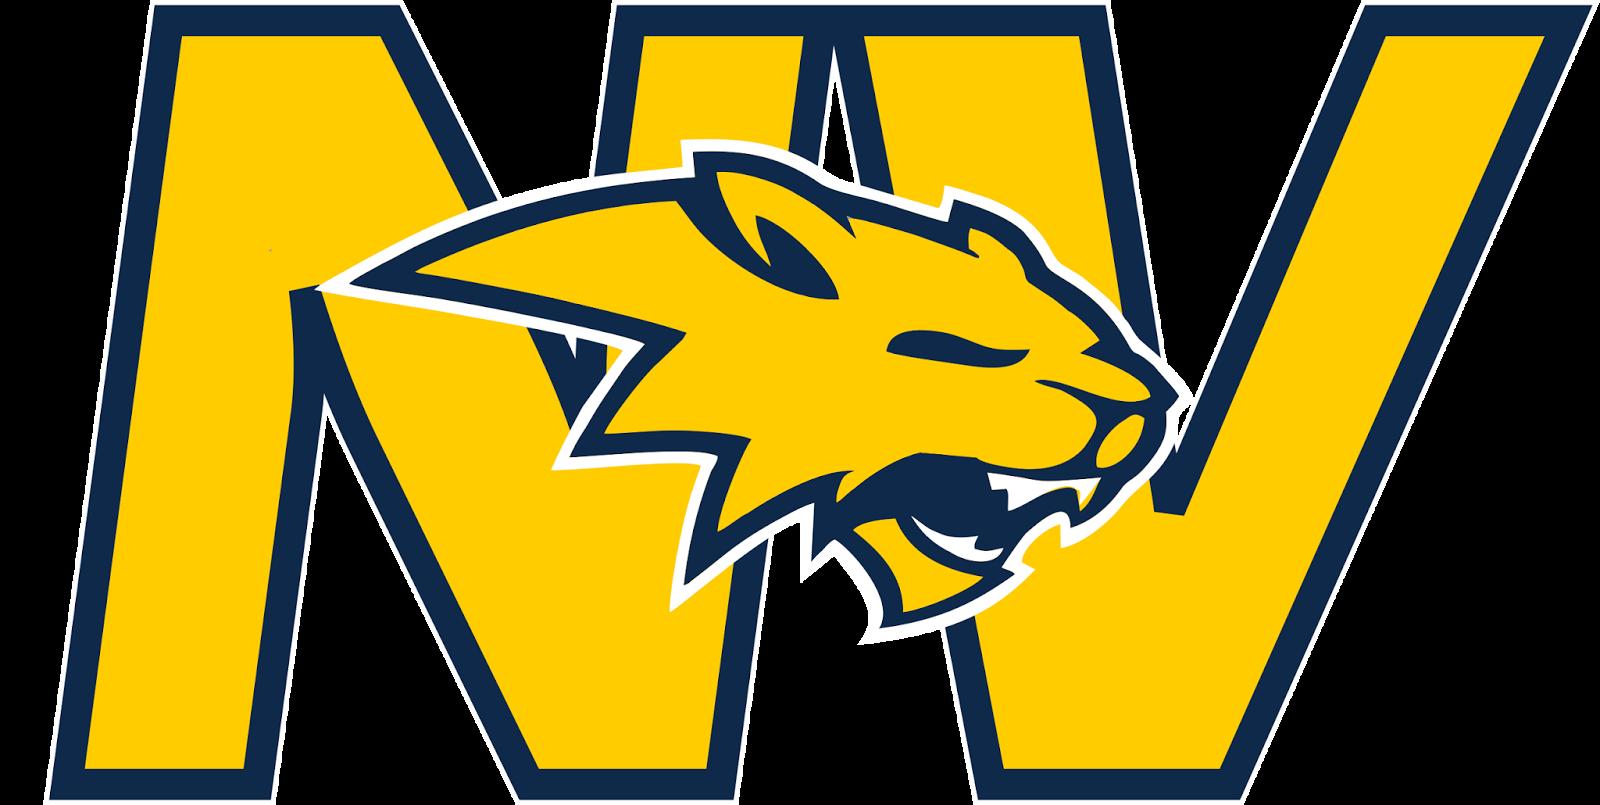 Wildcat baseball clipart vector free stock Neuqua Valley News: Wildcat Summer Athletic Camps vector free stock